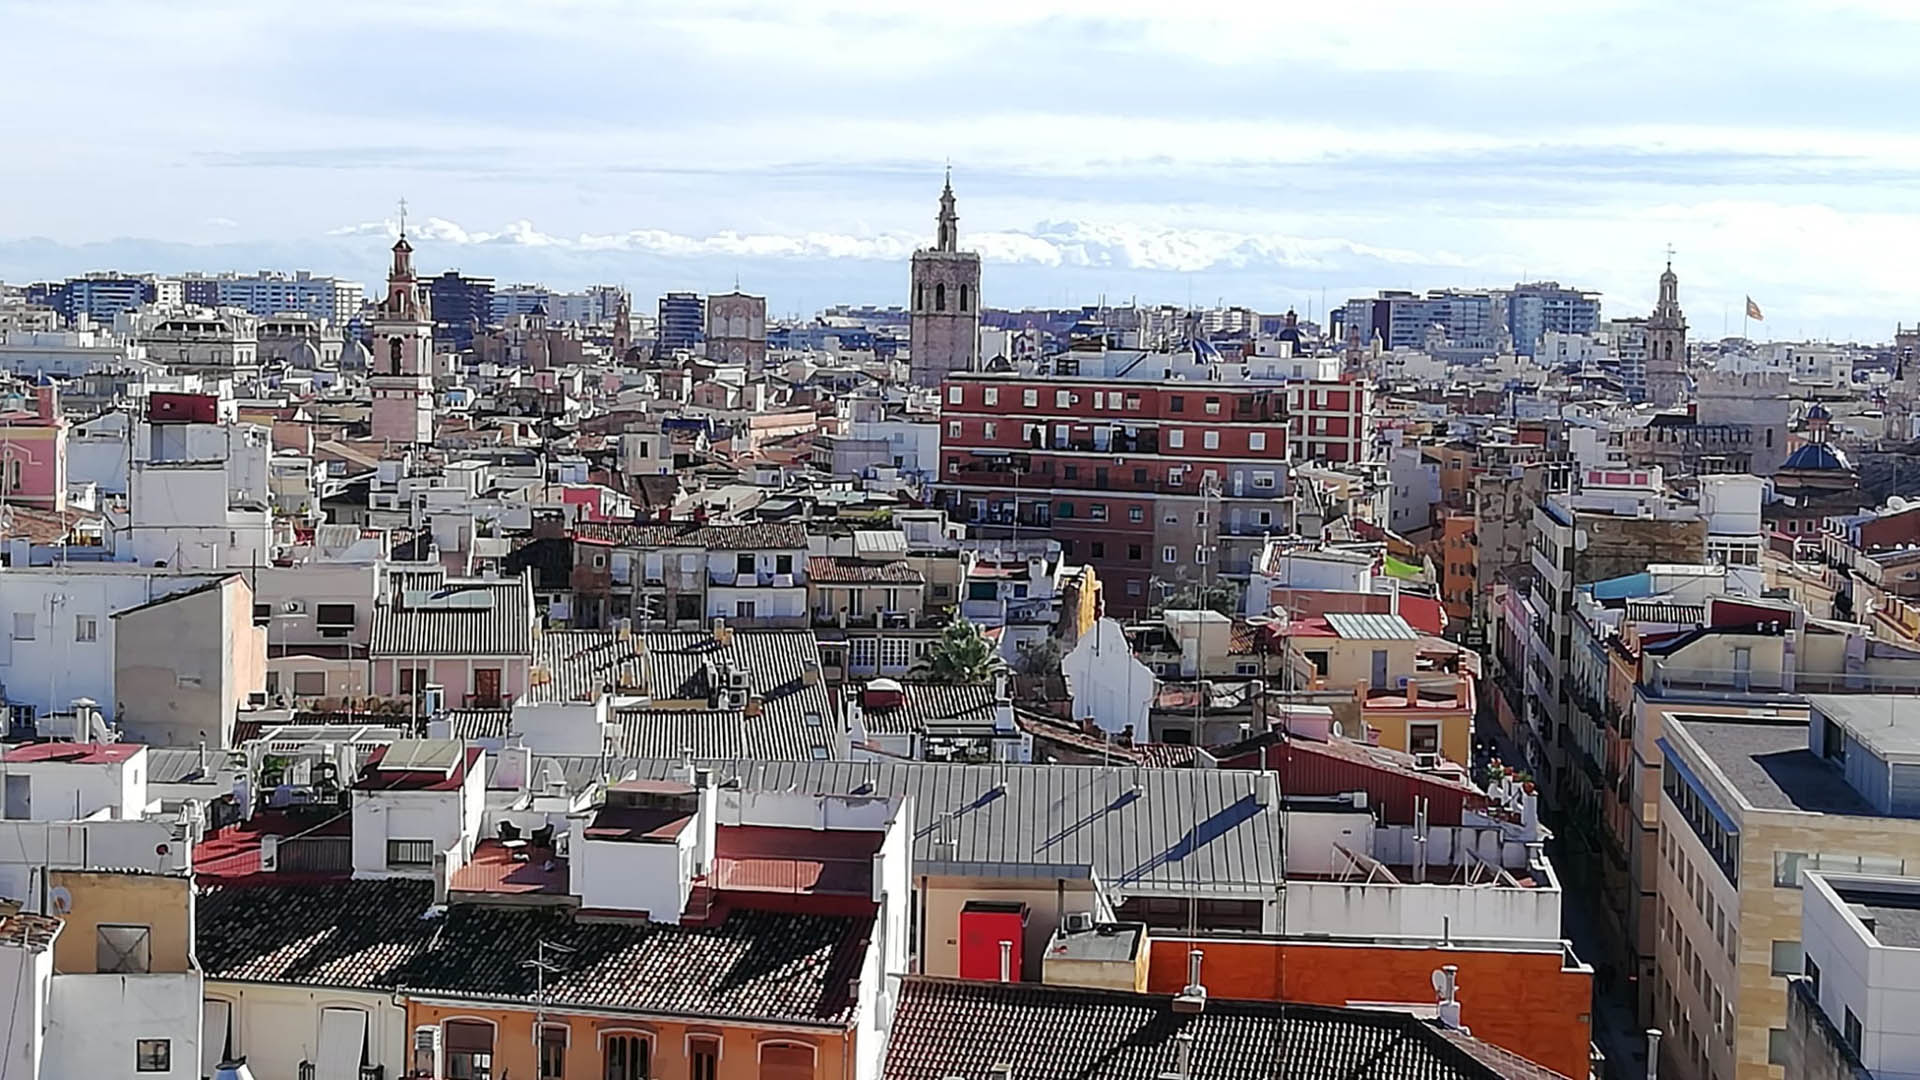 Vista aèria de València